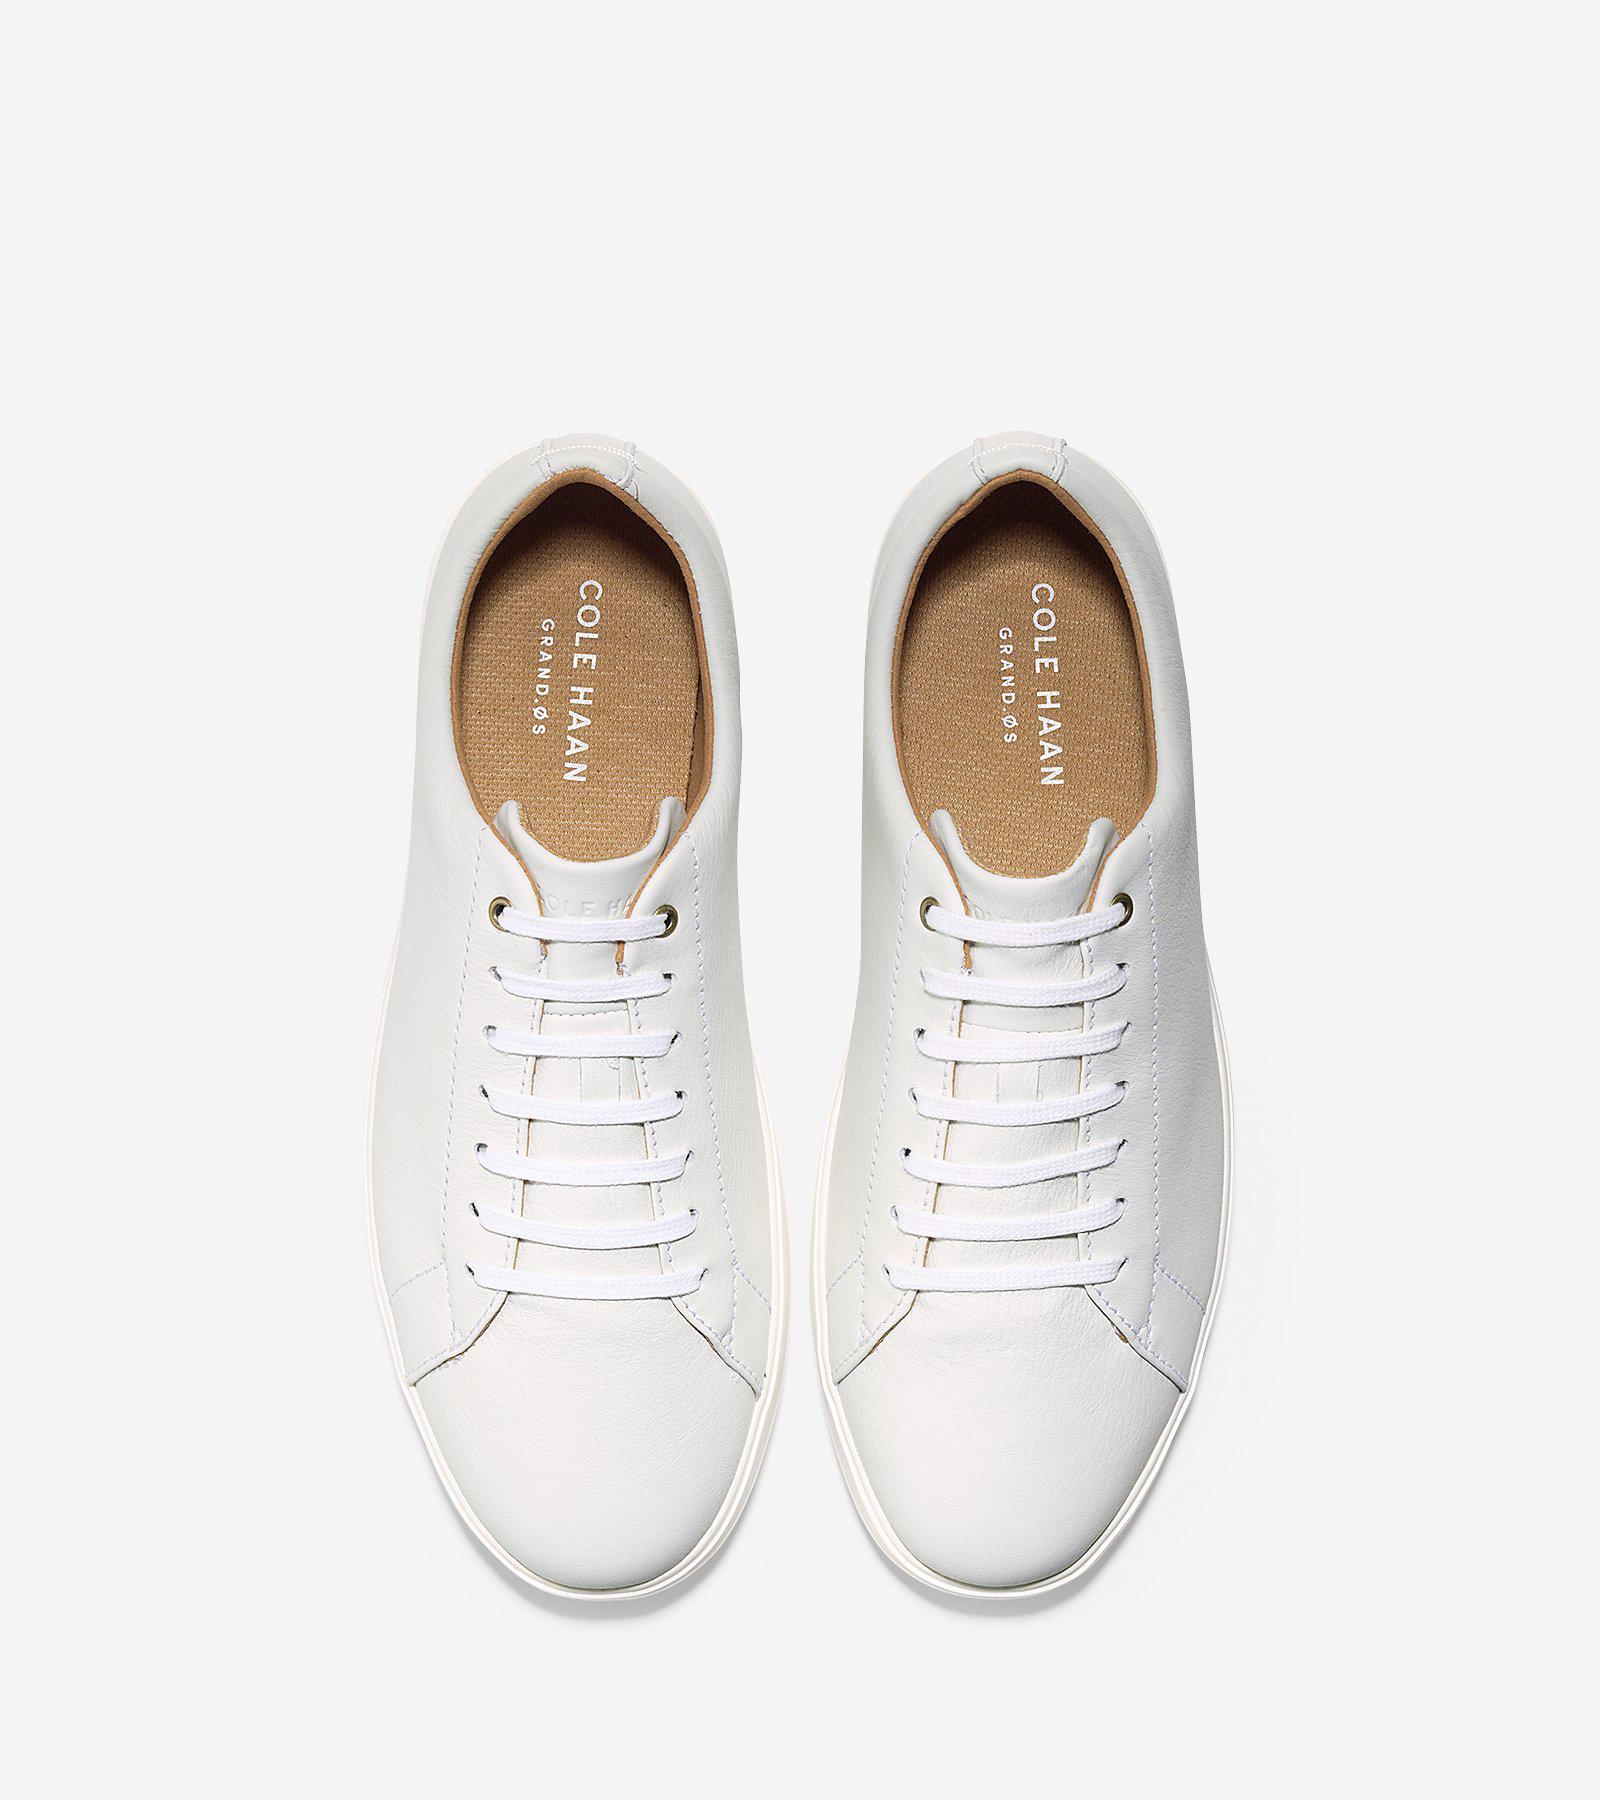 a6df21b553 Men's Grand Crosscourt Sneaker in White Leather | Cole Haan US